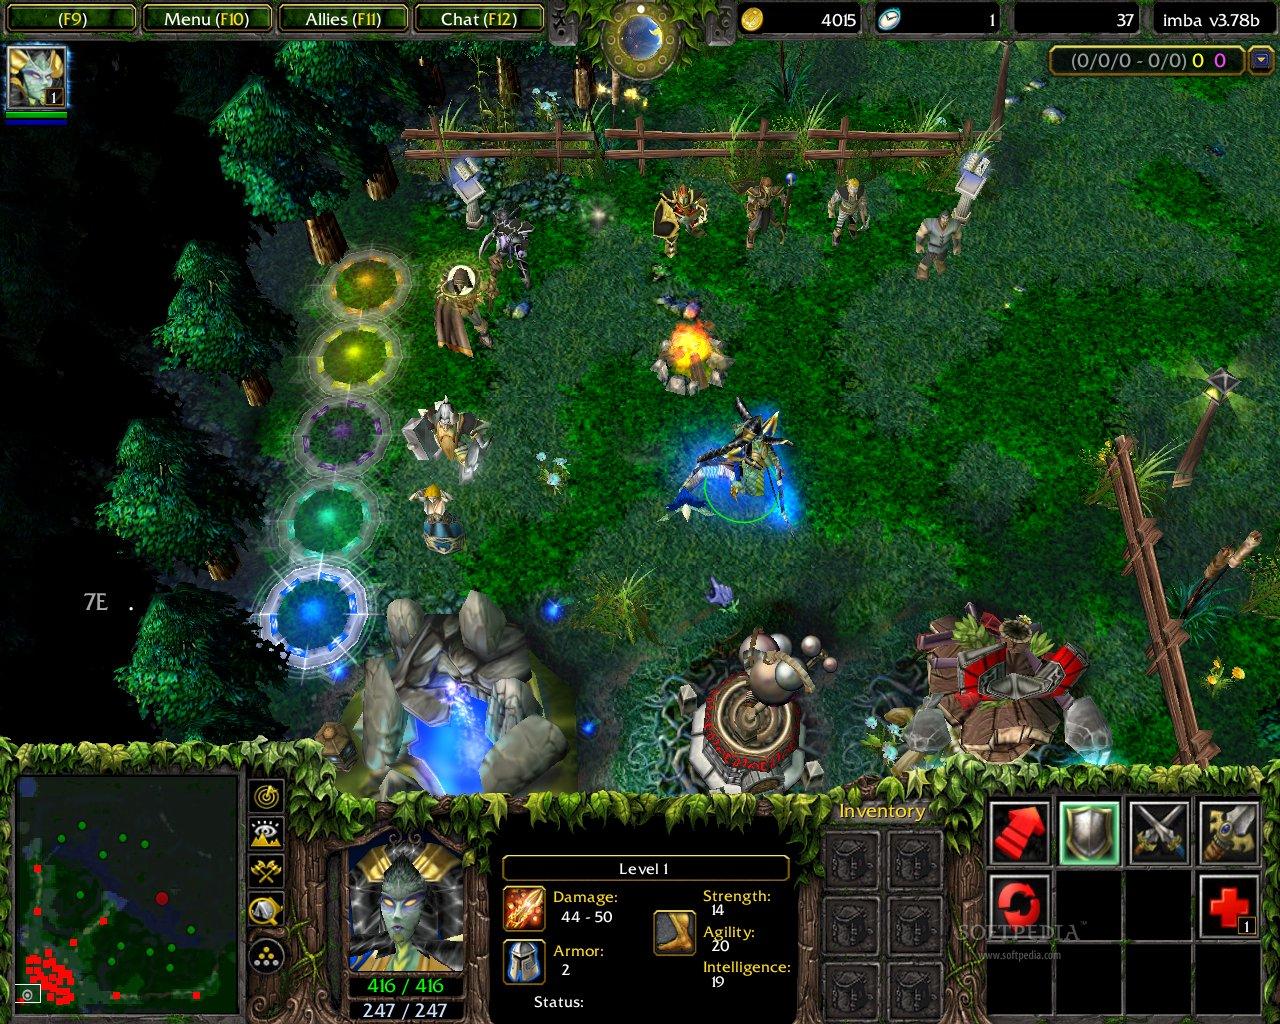 Warcraft 3 Maps Dota 6 75 Ai For Mac